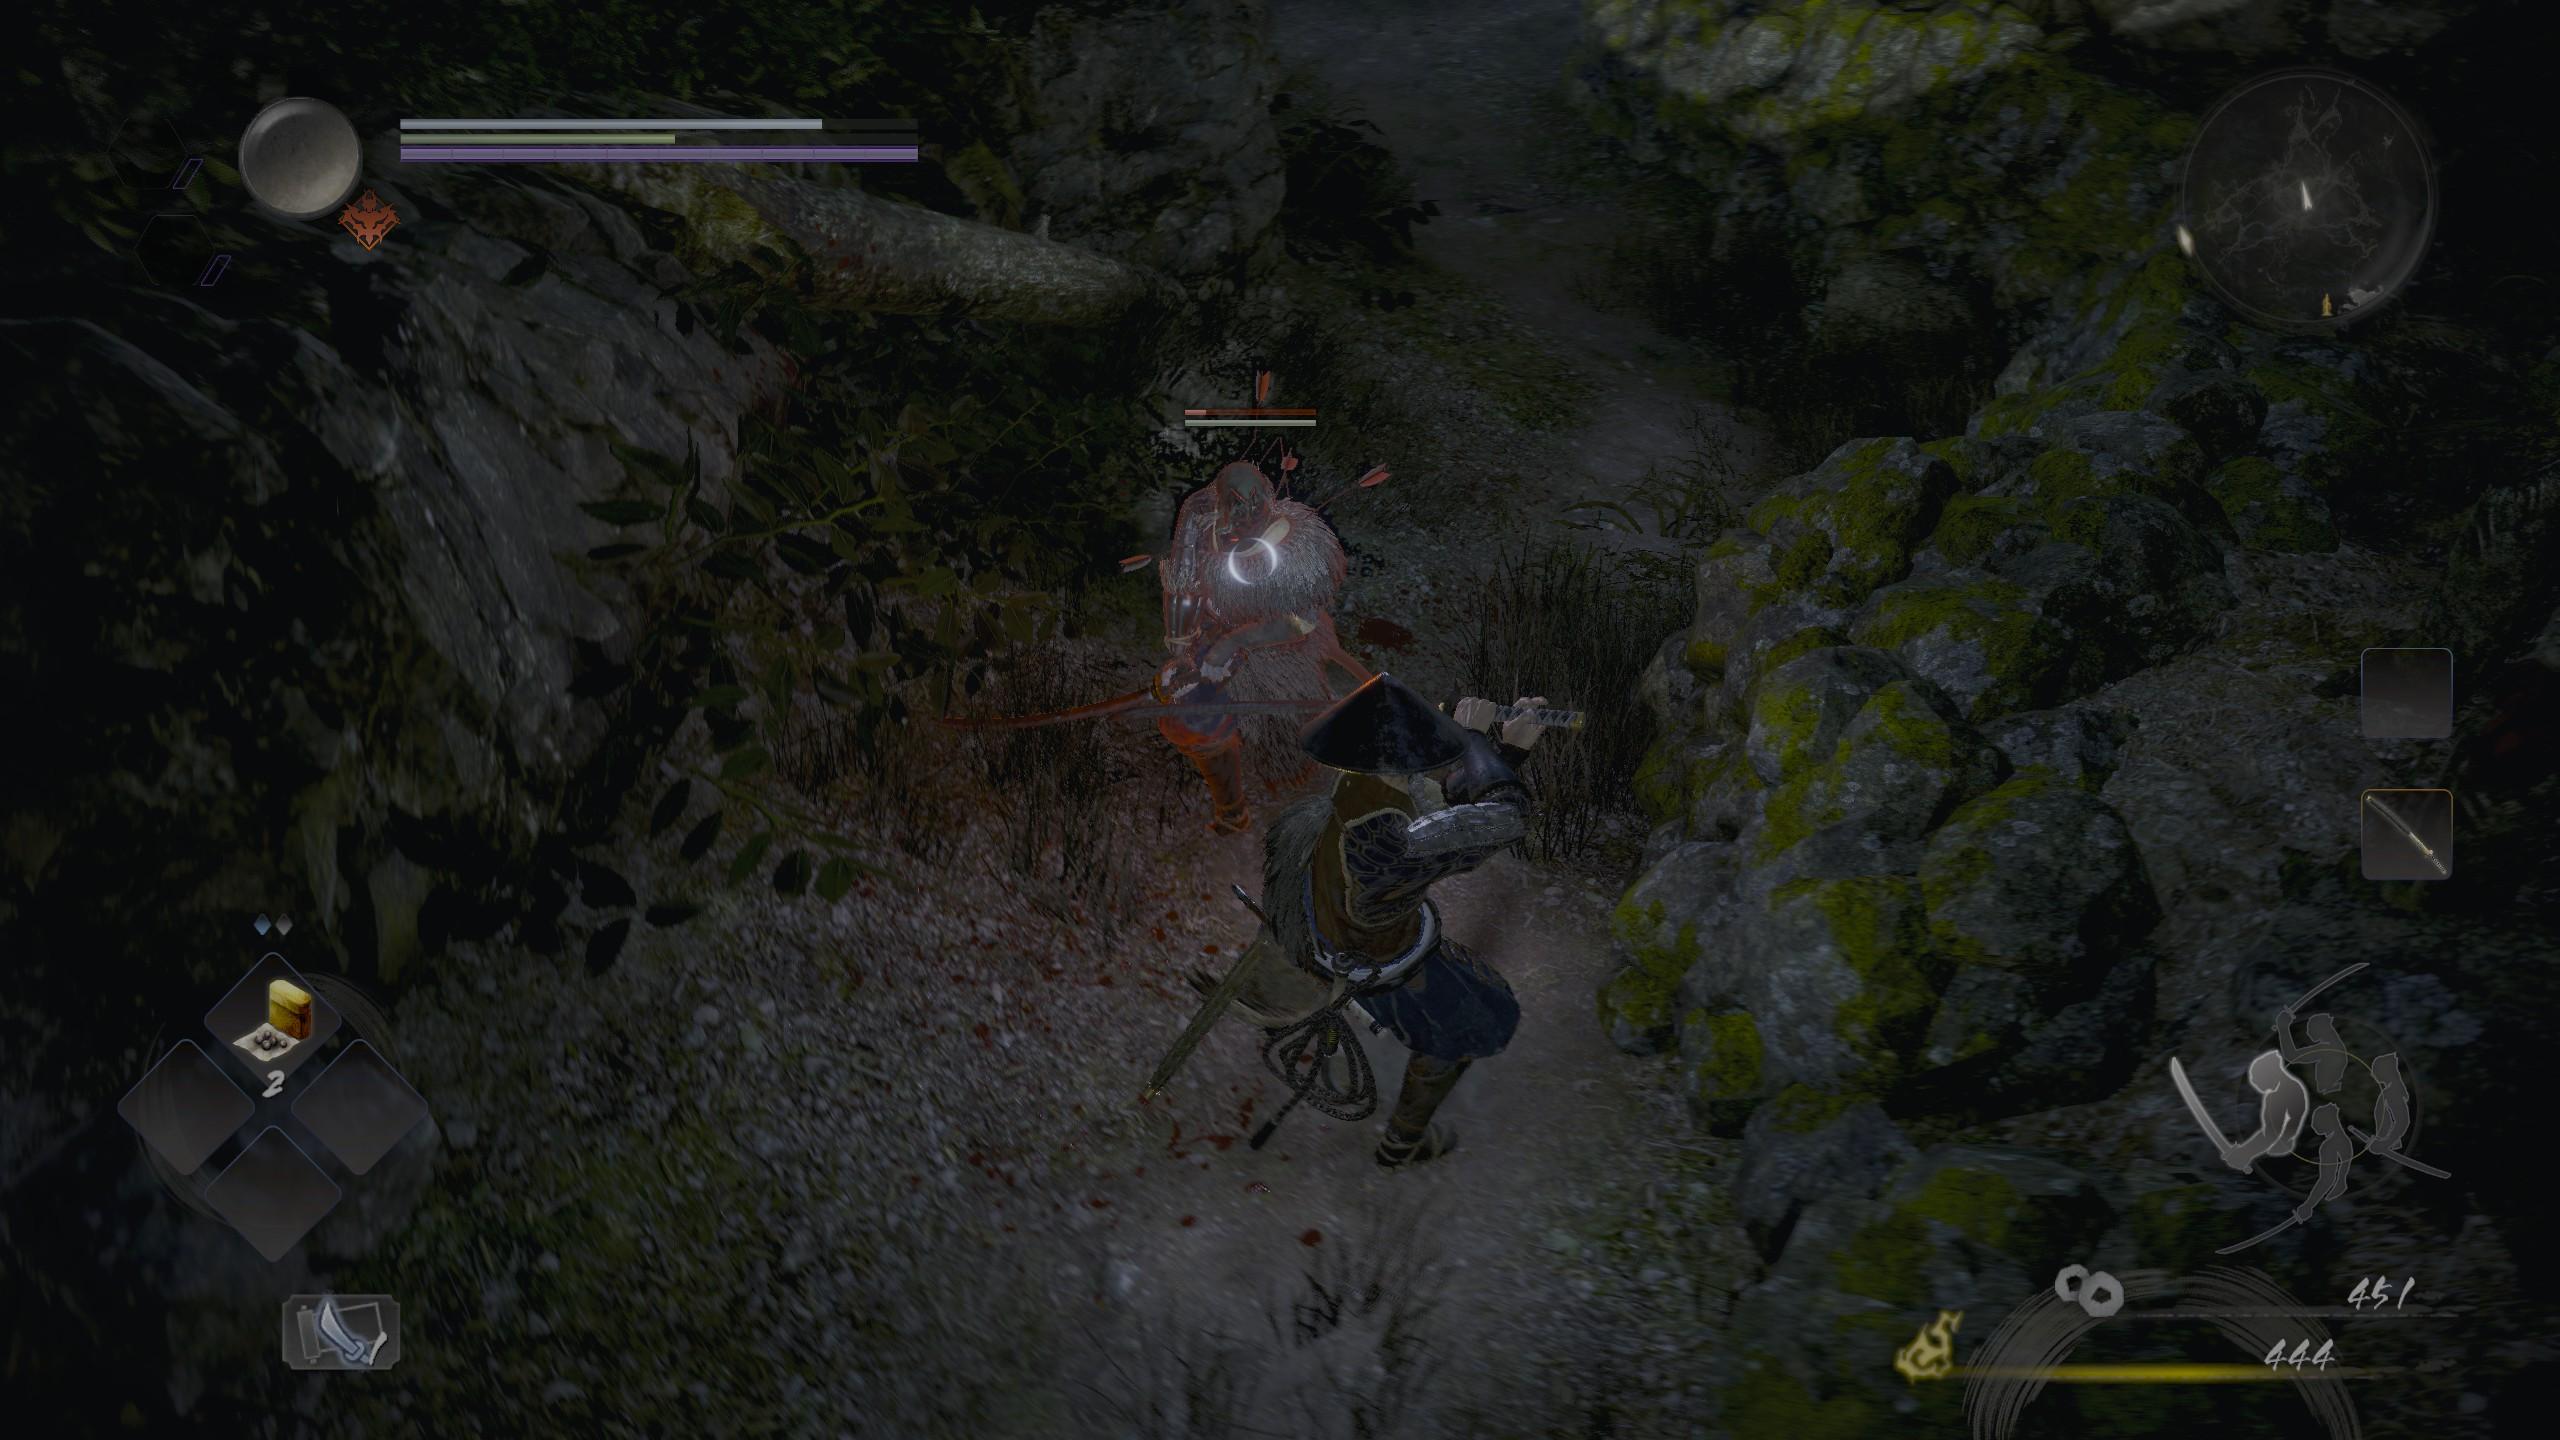 Recenzja Nioh 2 PC